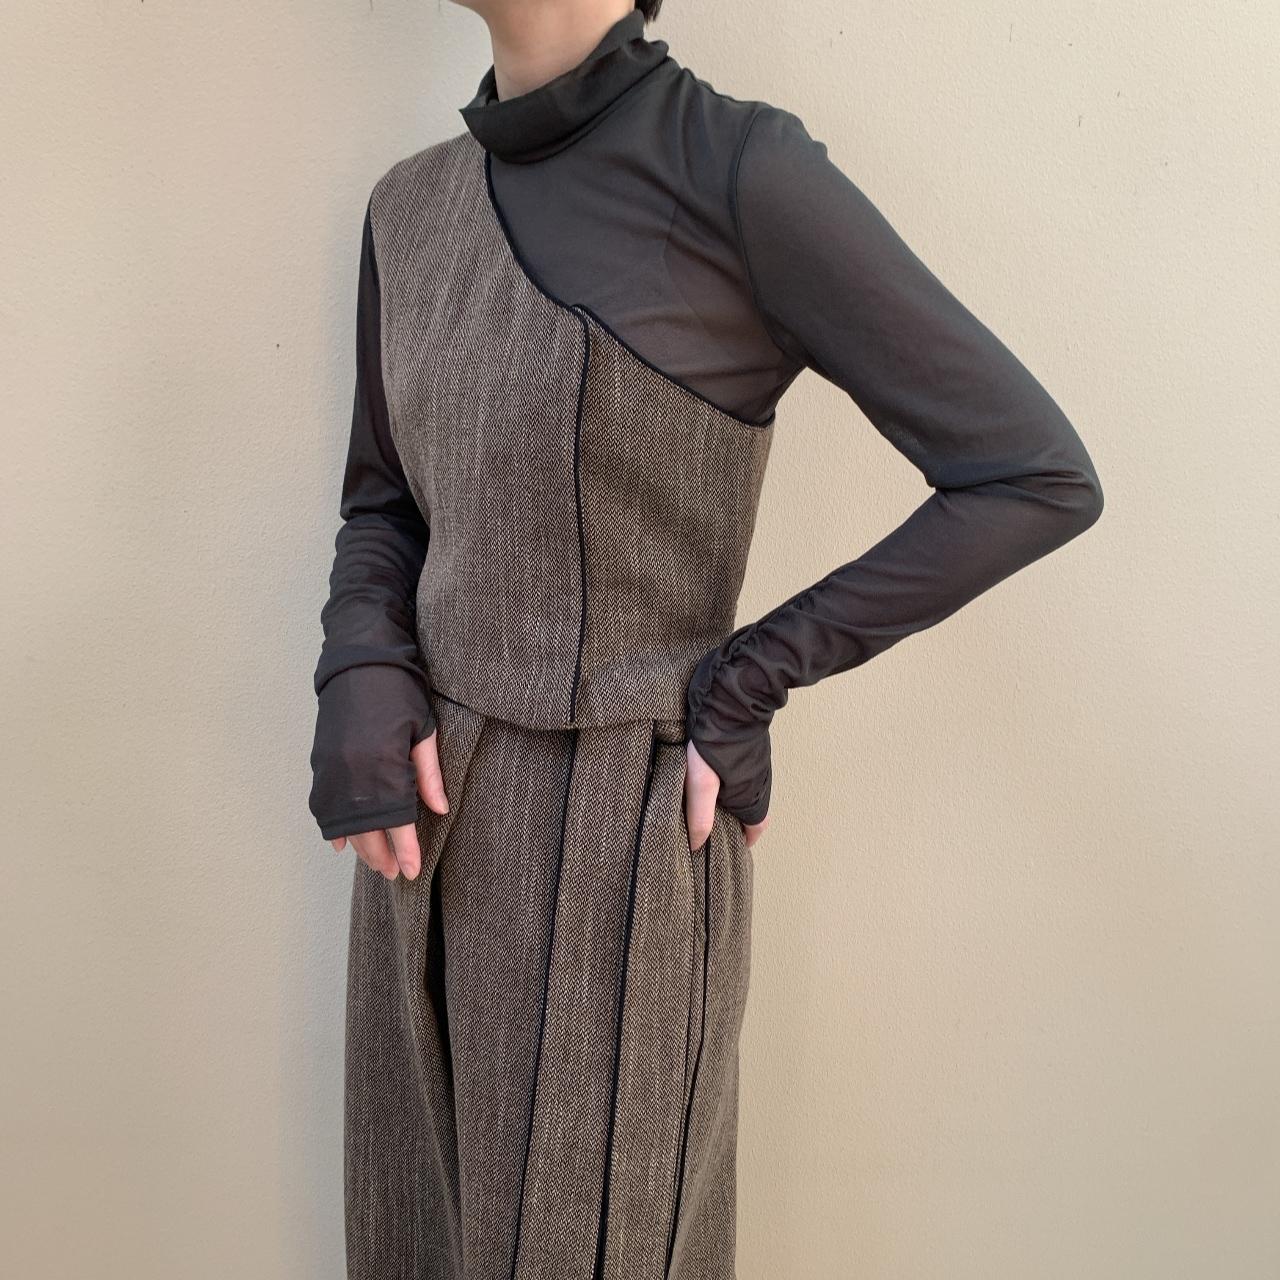 VillD - tweed one shoulder vest